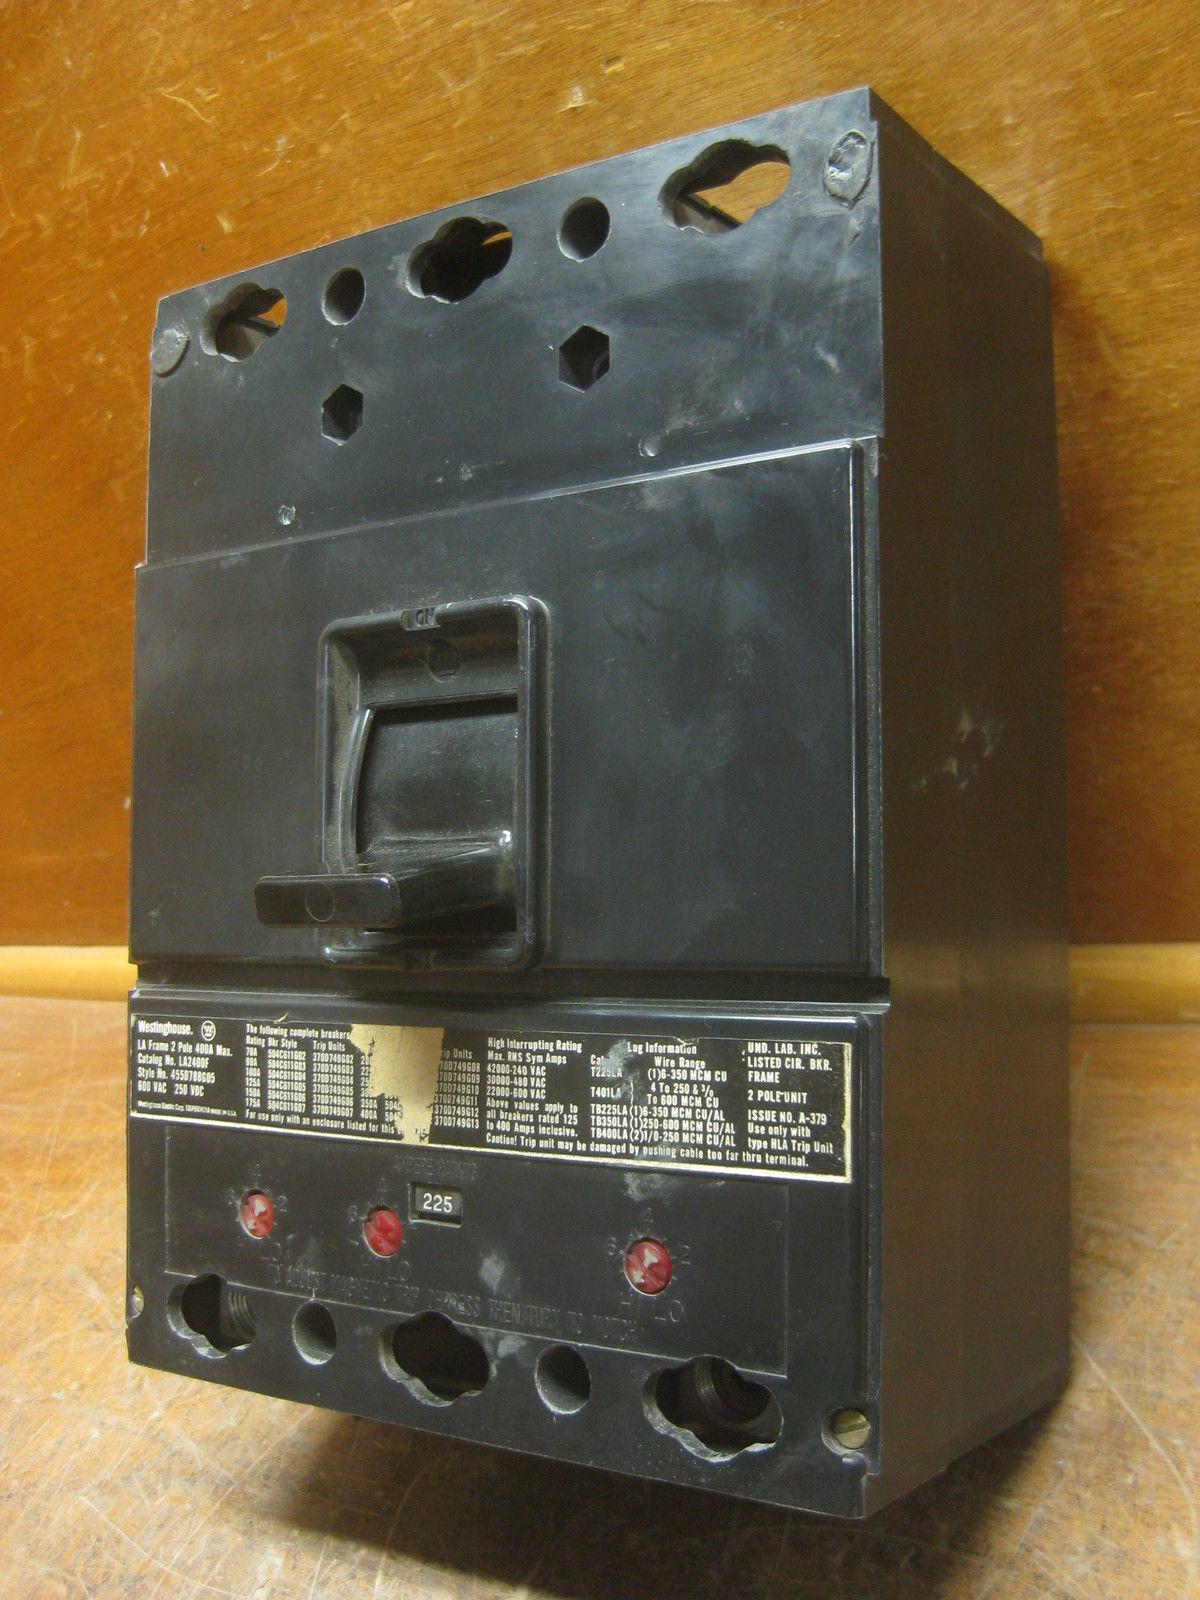 Westinghouse la2400f 400a 400a 400a Circuit Breaker 225 A Viaje la2225 Cutler-hammer 400 Amp 9ce8cc